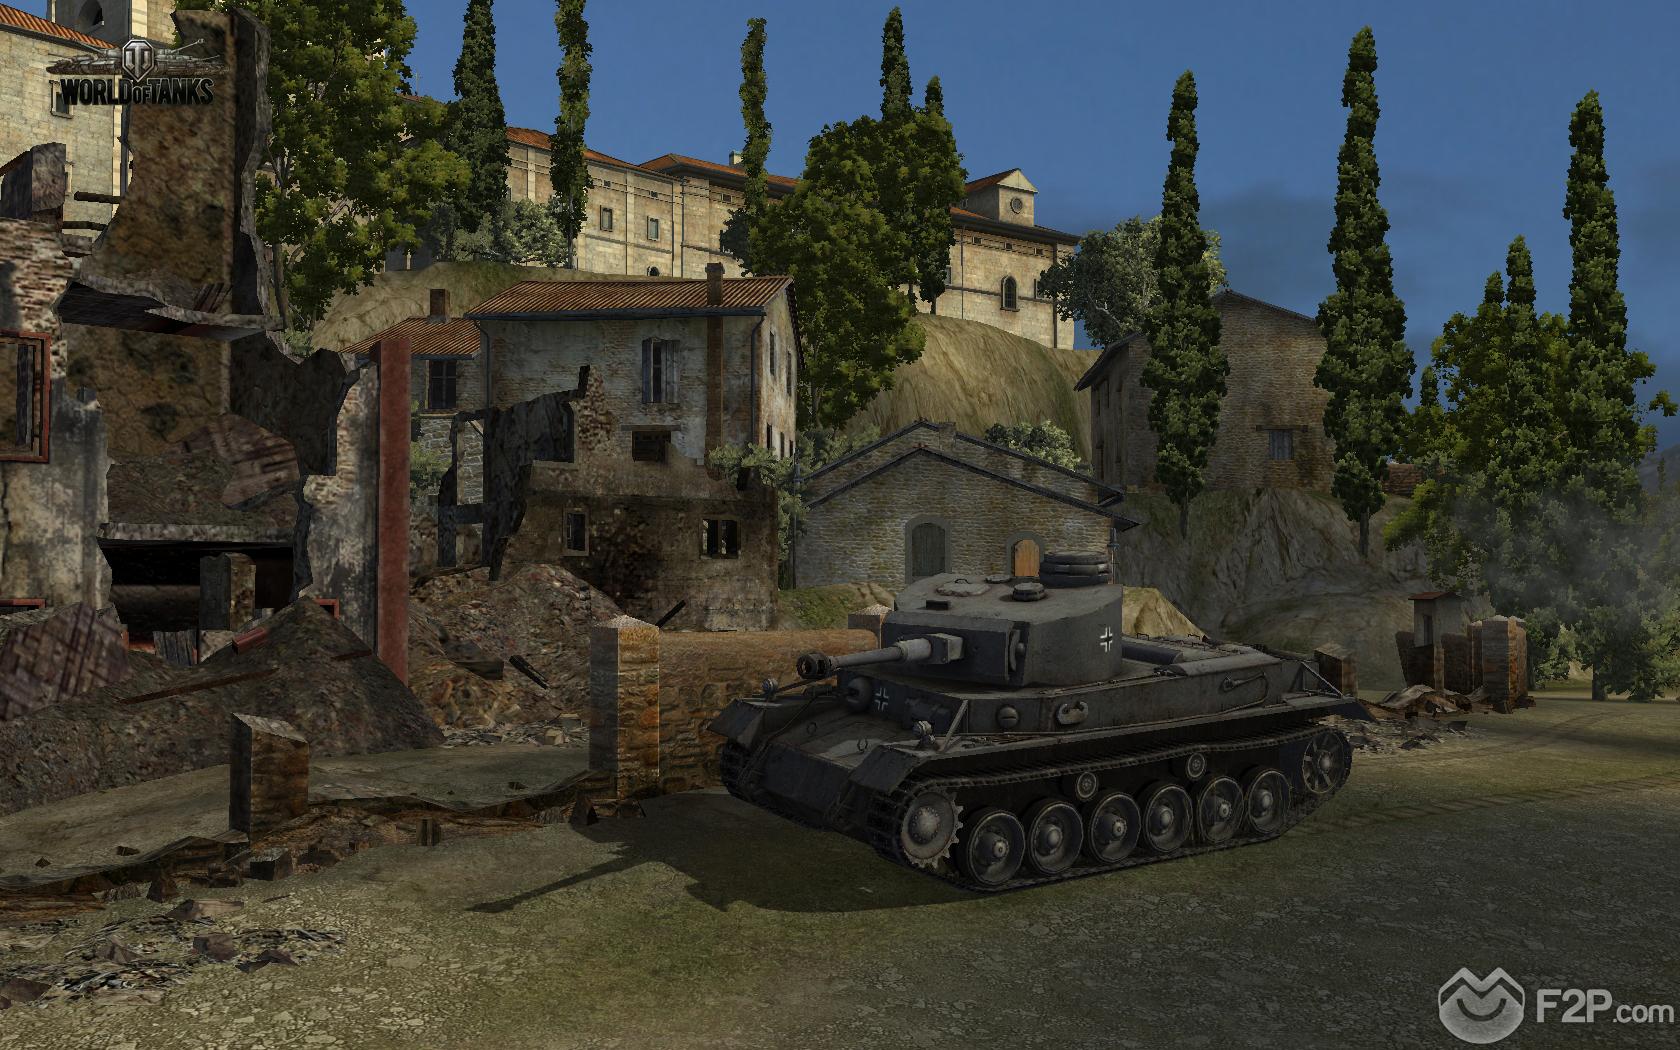 Click image for larger version.Name:World of Tanks 64.jpgViews:138Size:1.48 MBID:3841